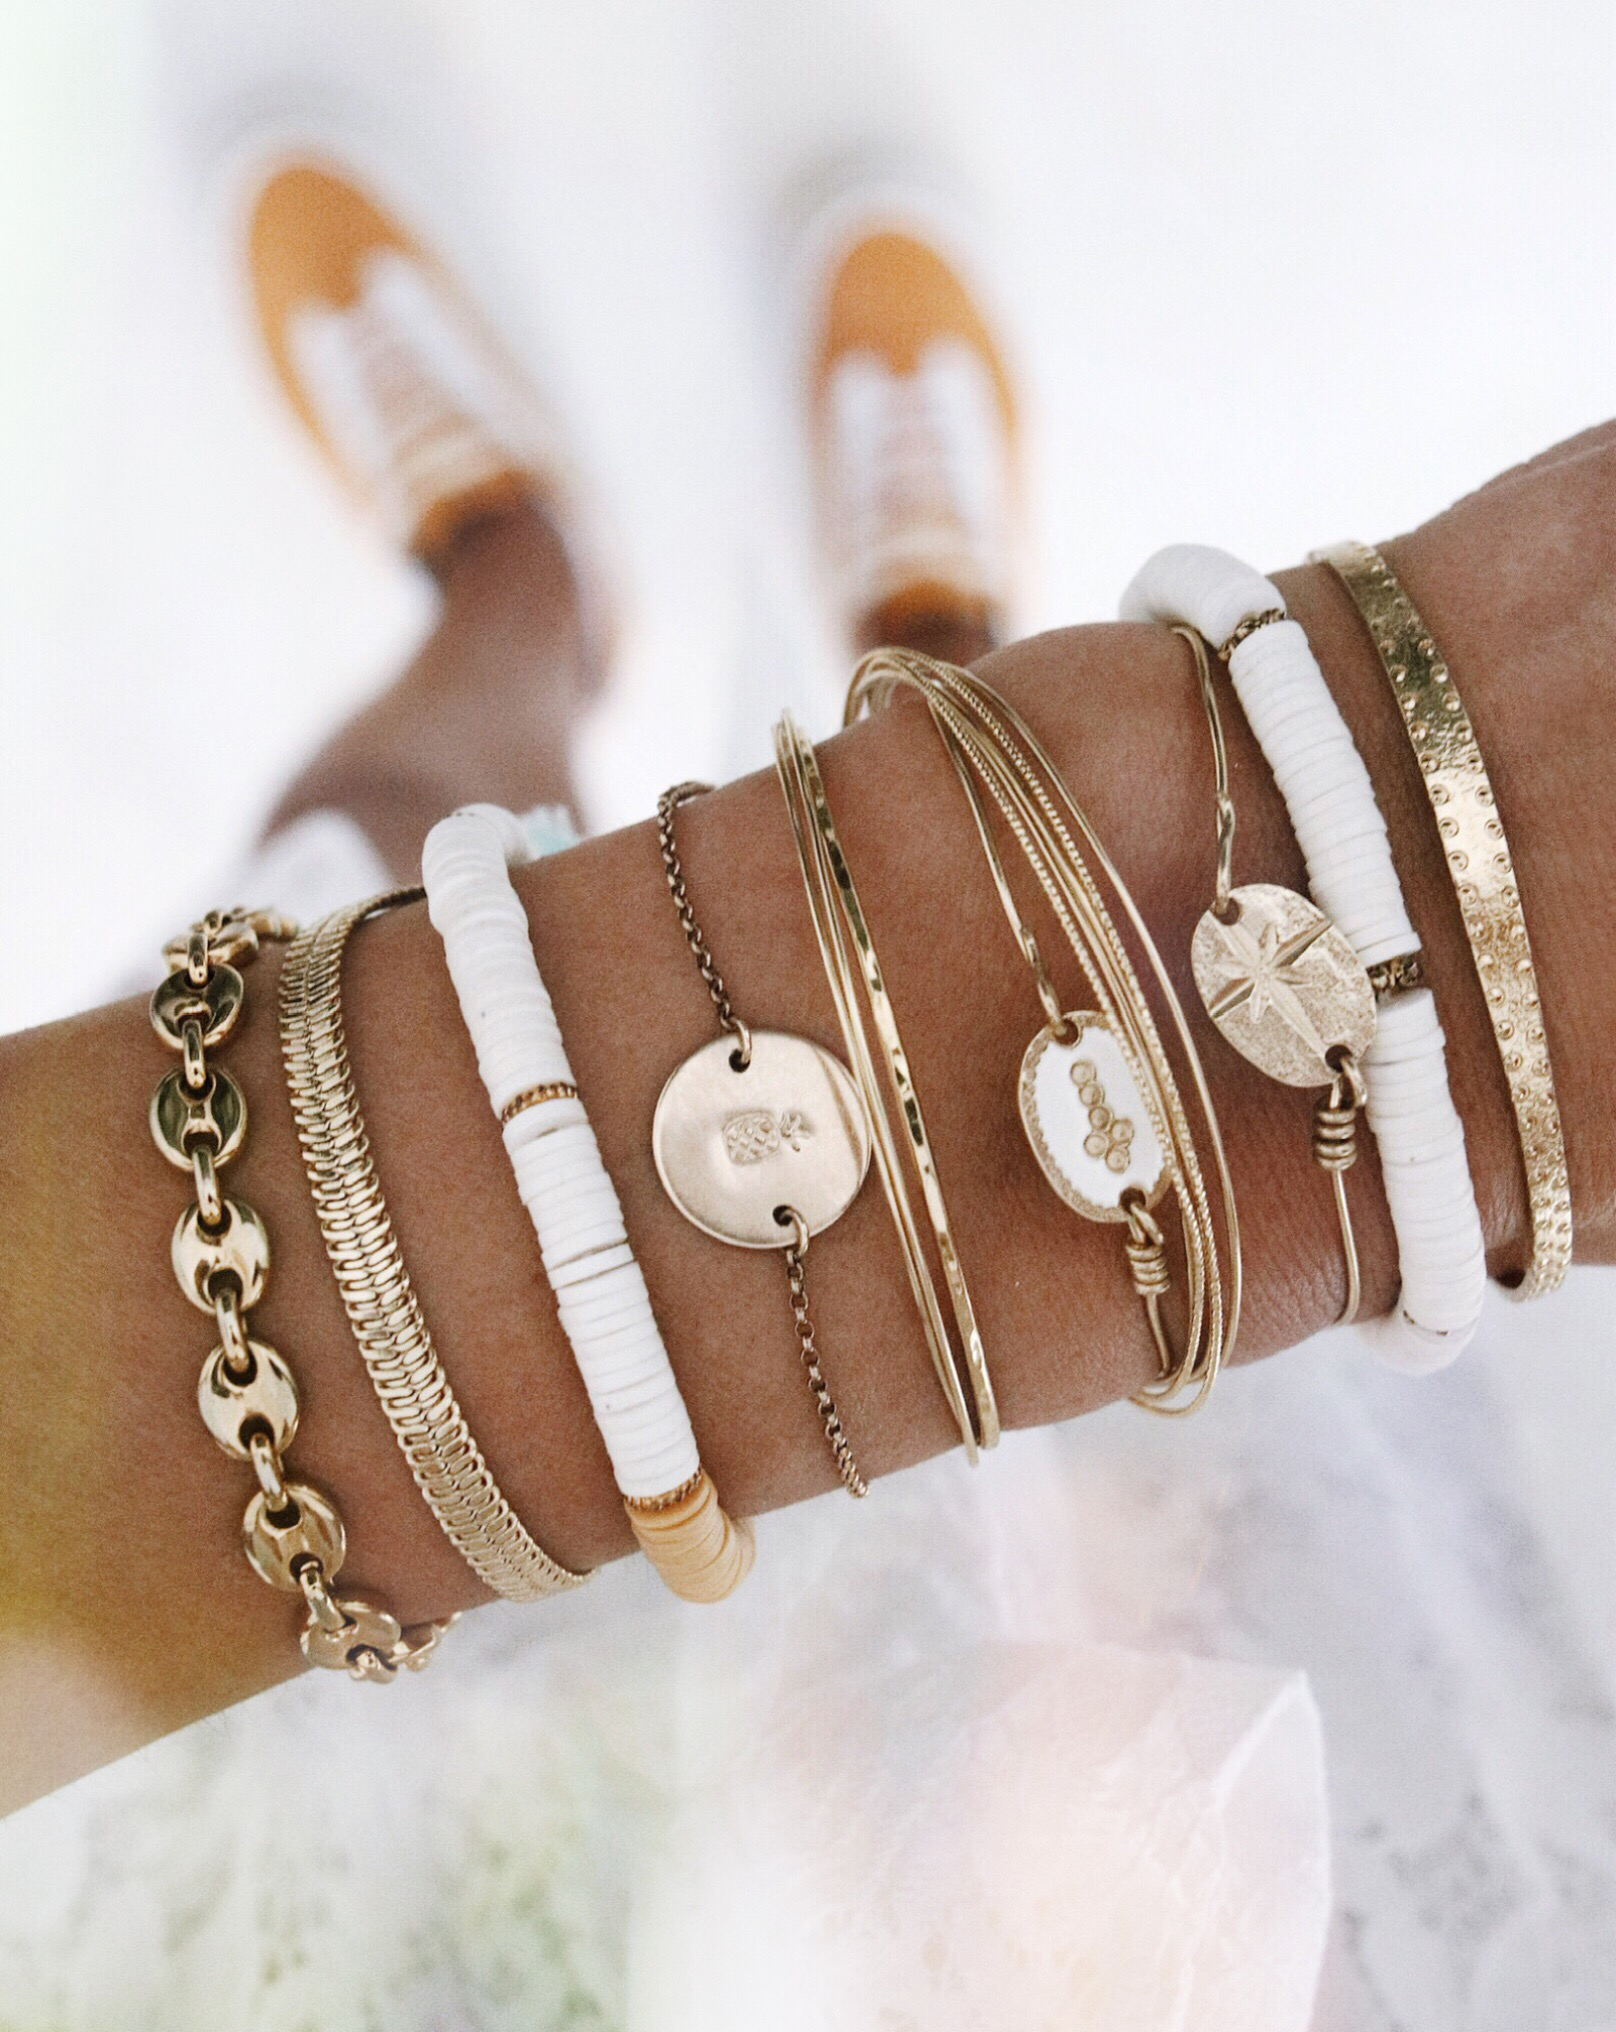 @chon.and.chon www.chonandchon.com, gold bracelets, handmade jewelry, gold jewelry, armcandy, bracelets accumulation, bracelets or